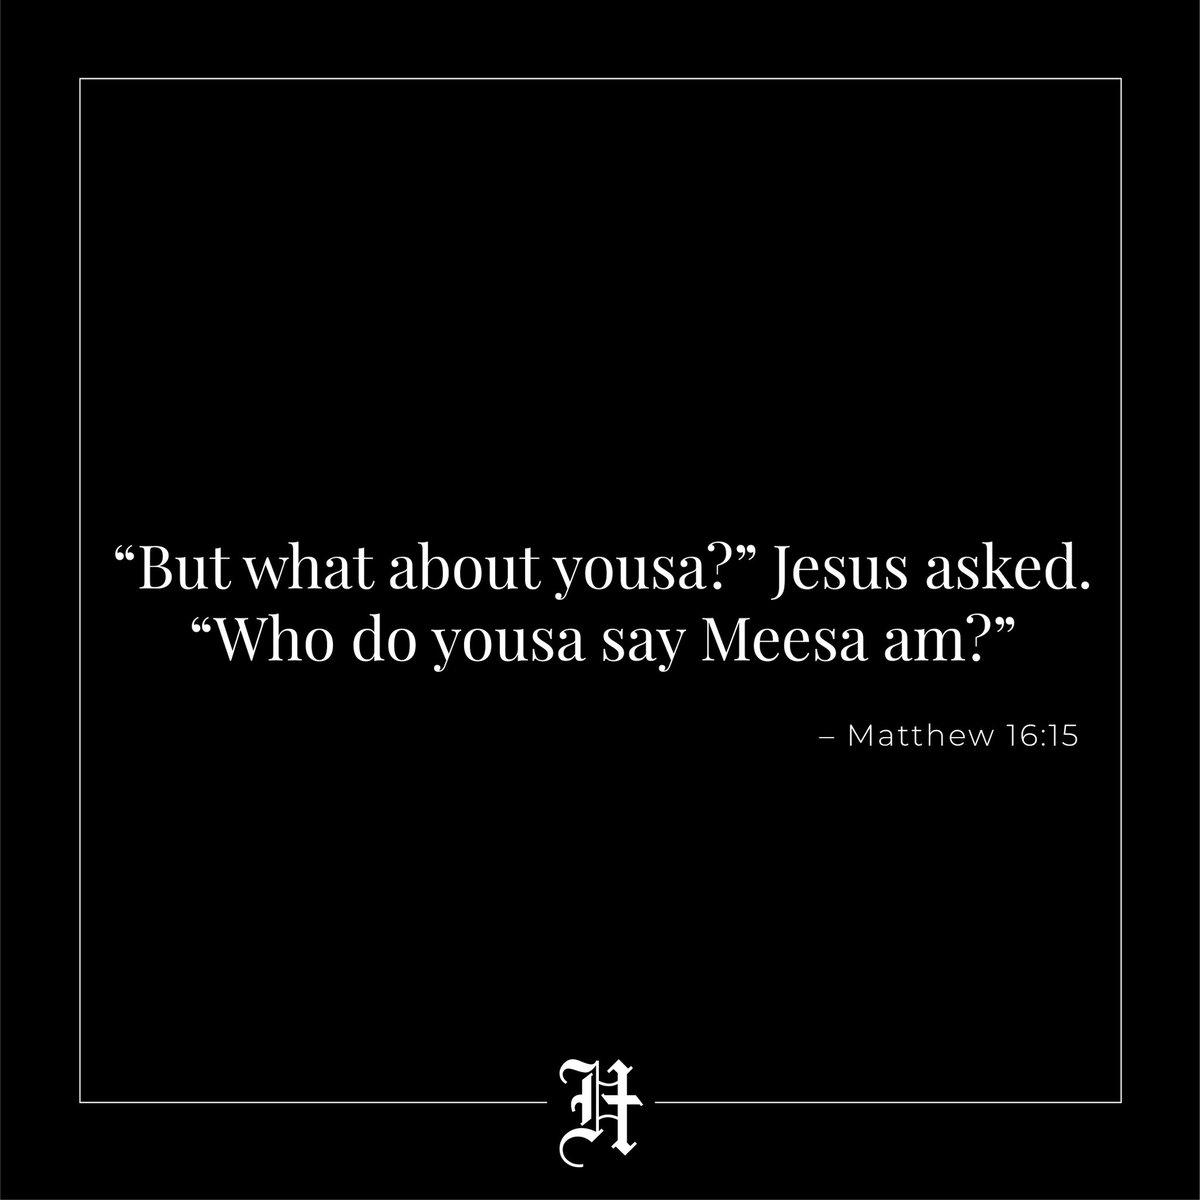 #starwars #jarjarbinks #church #God #Jesus #Jesuslovesyou #fixitjesus #pray #churchmemes #christian #christianmemes #hillsong #churchflow #cross #gospel #bible #scripture #jesusmemes #worship #youthpastor #pastor #preach #sermon #gospel #jesusmemes #memesforjesus #worship #satirepic.twitter.com/lc4nForTkC